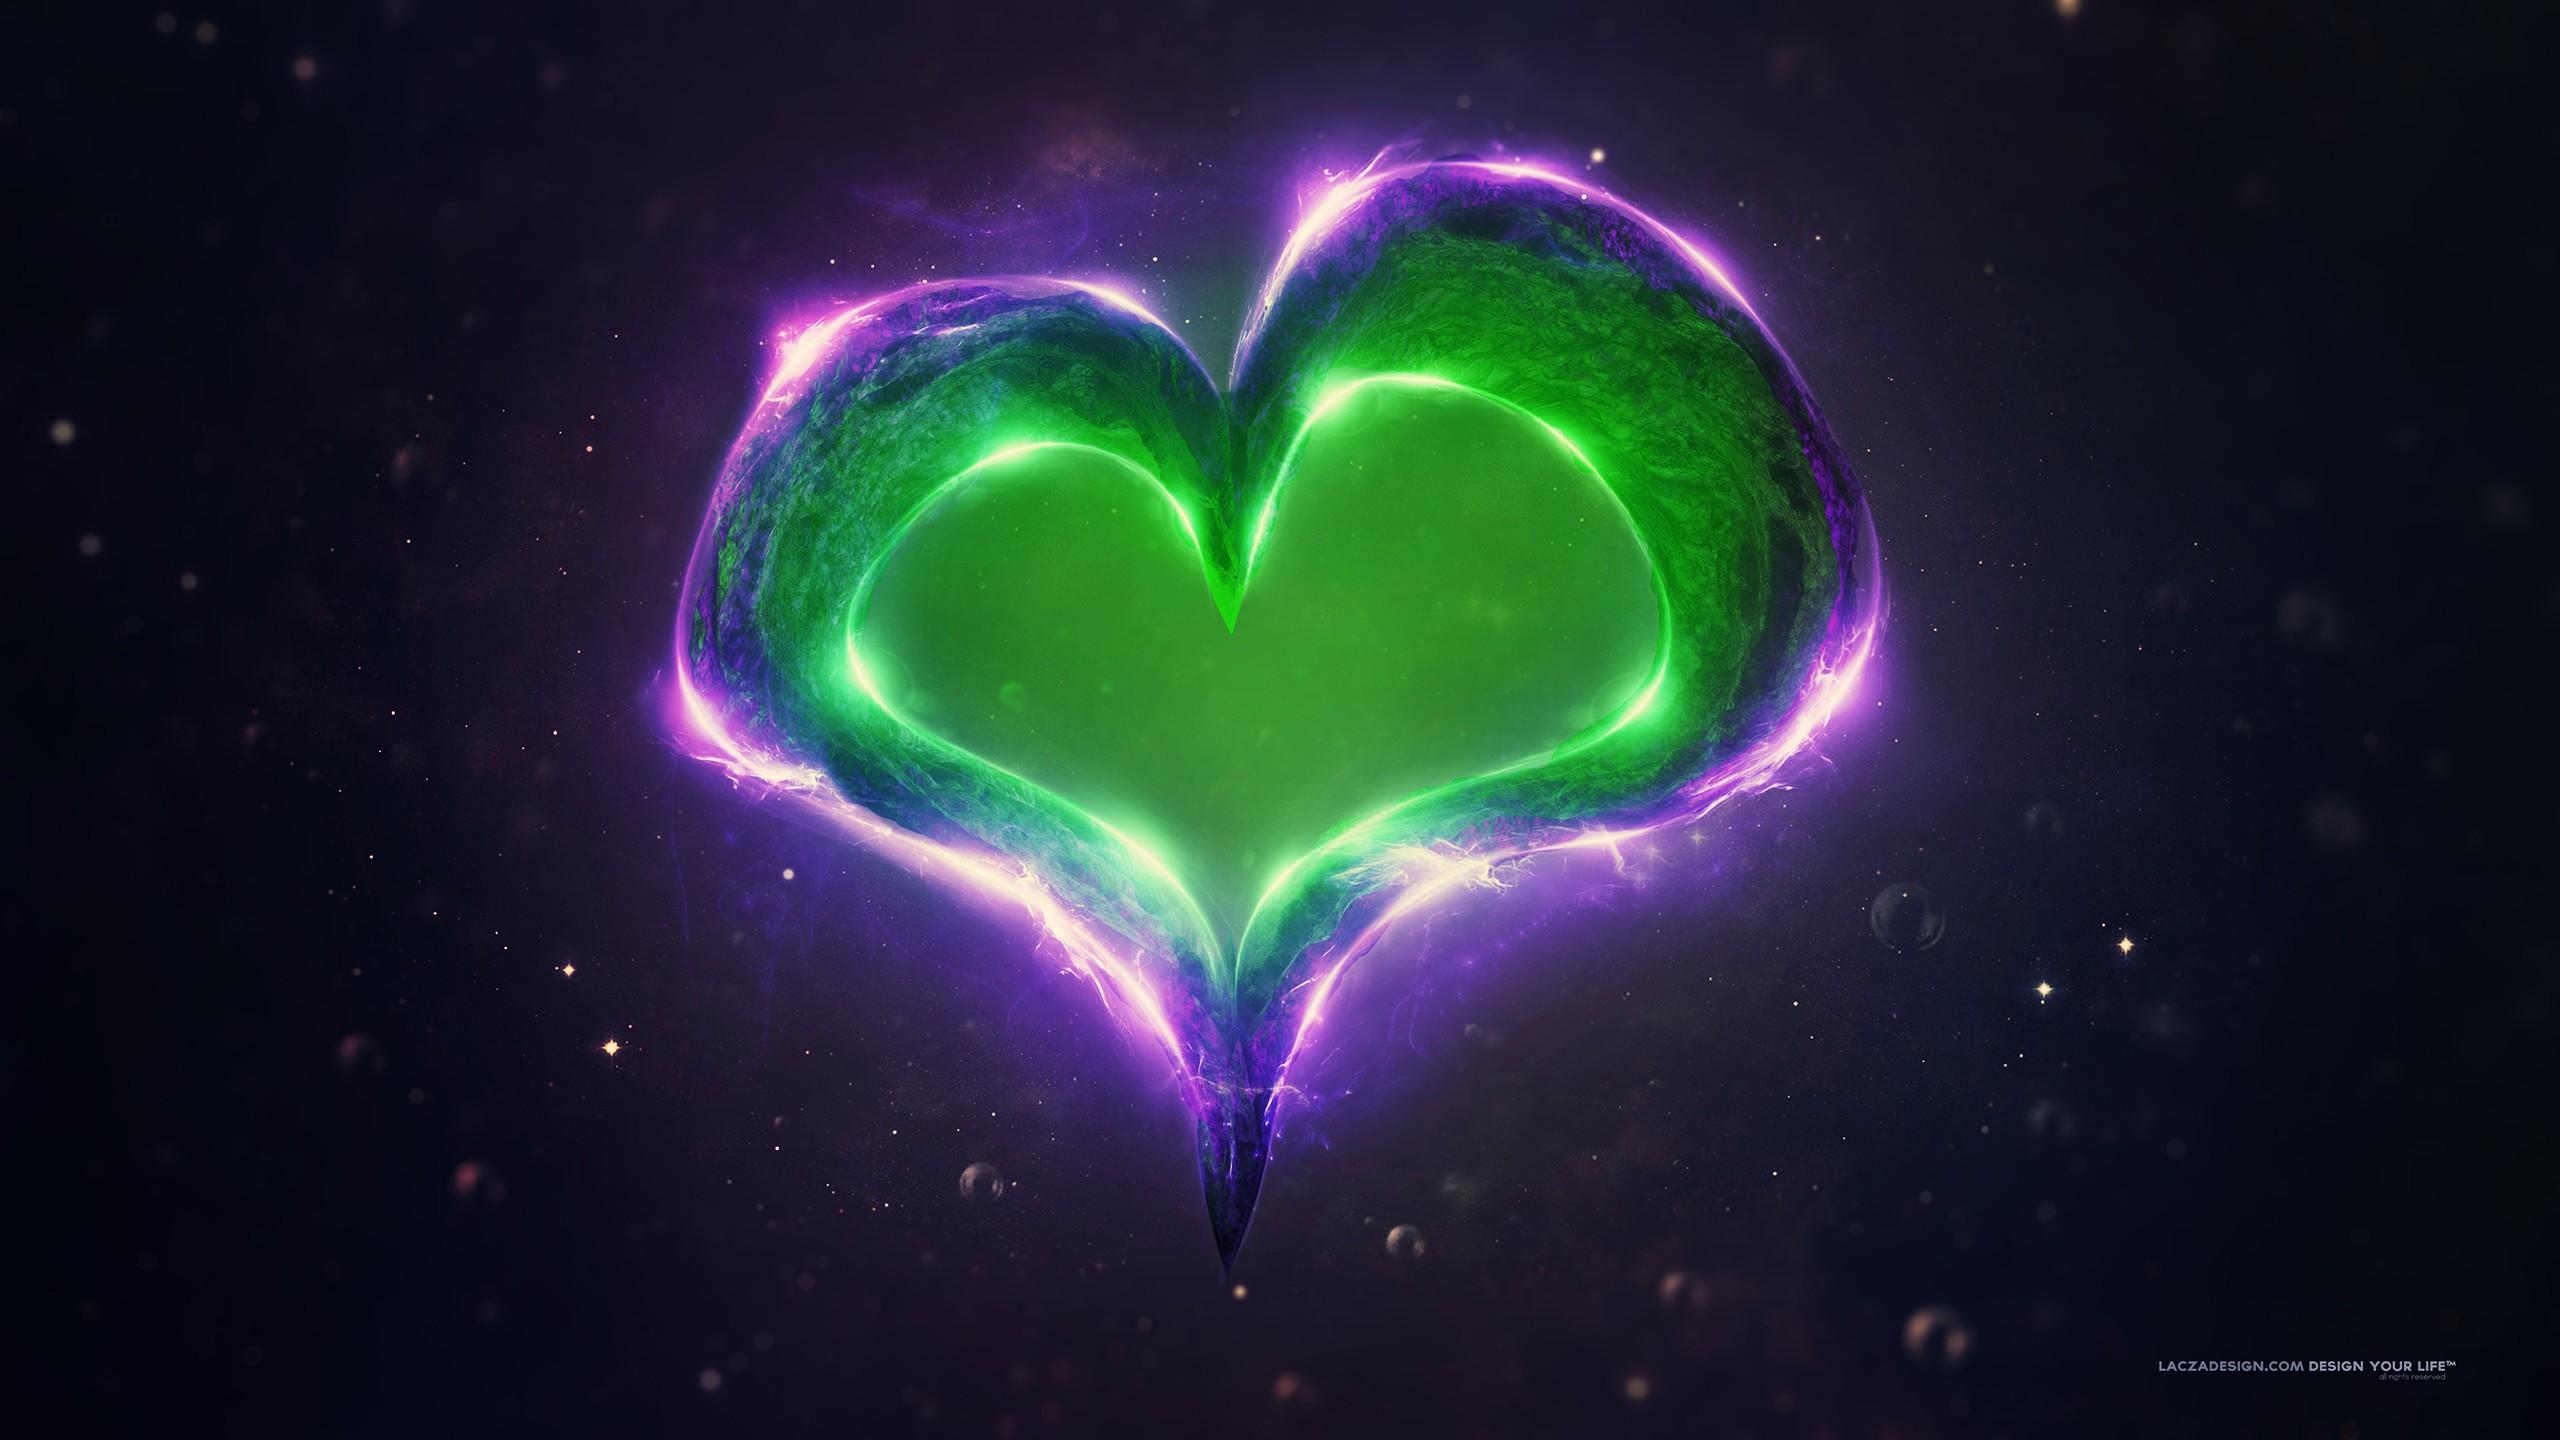 Cute Pokemon Iphone Wallpapers Green Purple Love Heart Wallpapers Hd Wallpapers Id 18489